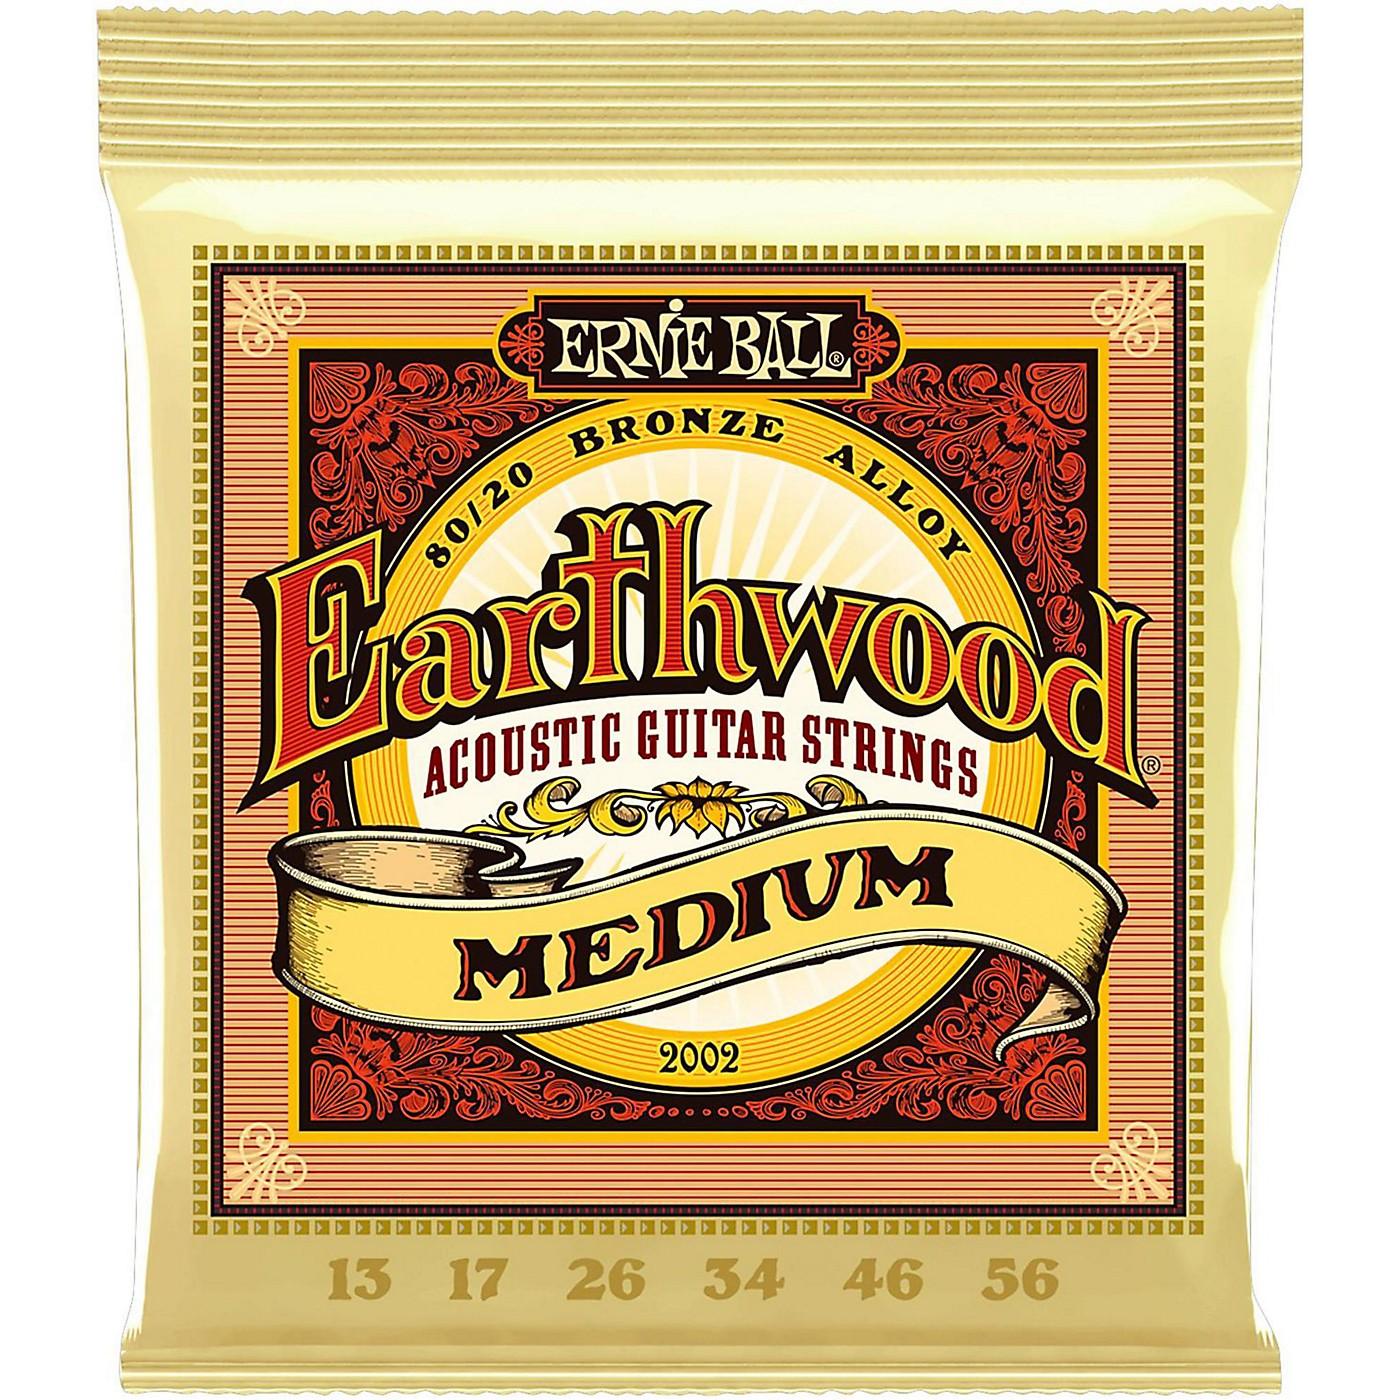 Ernie Ball 2002 Earthwood 80/20 Bronze Medium Acoustic Guitar Strings thumbnail